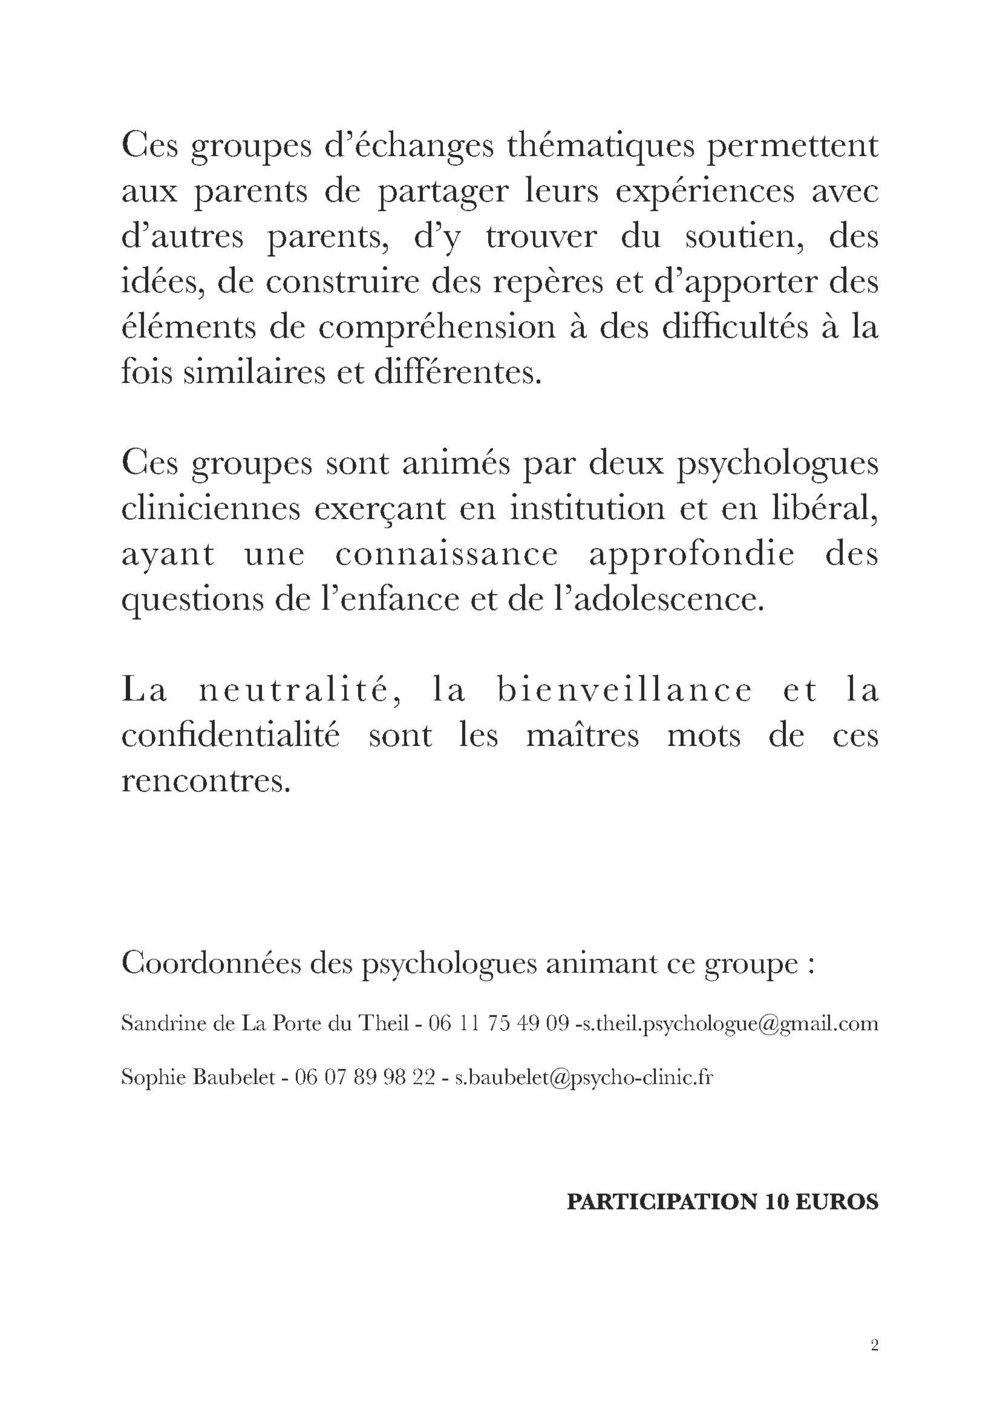 GP école 2 PSY_Page_2.jpg